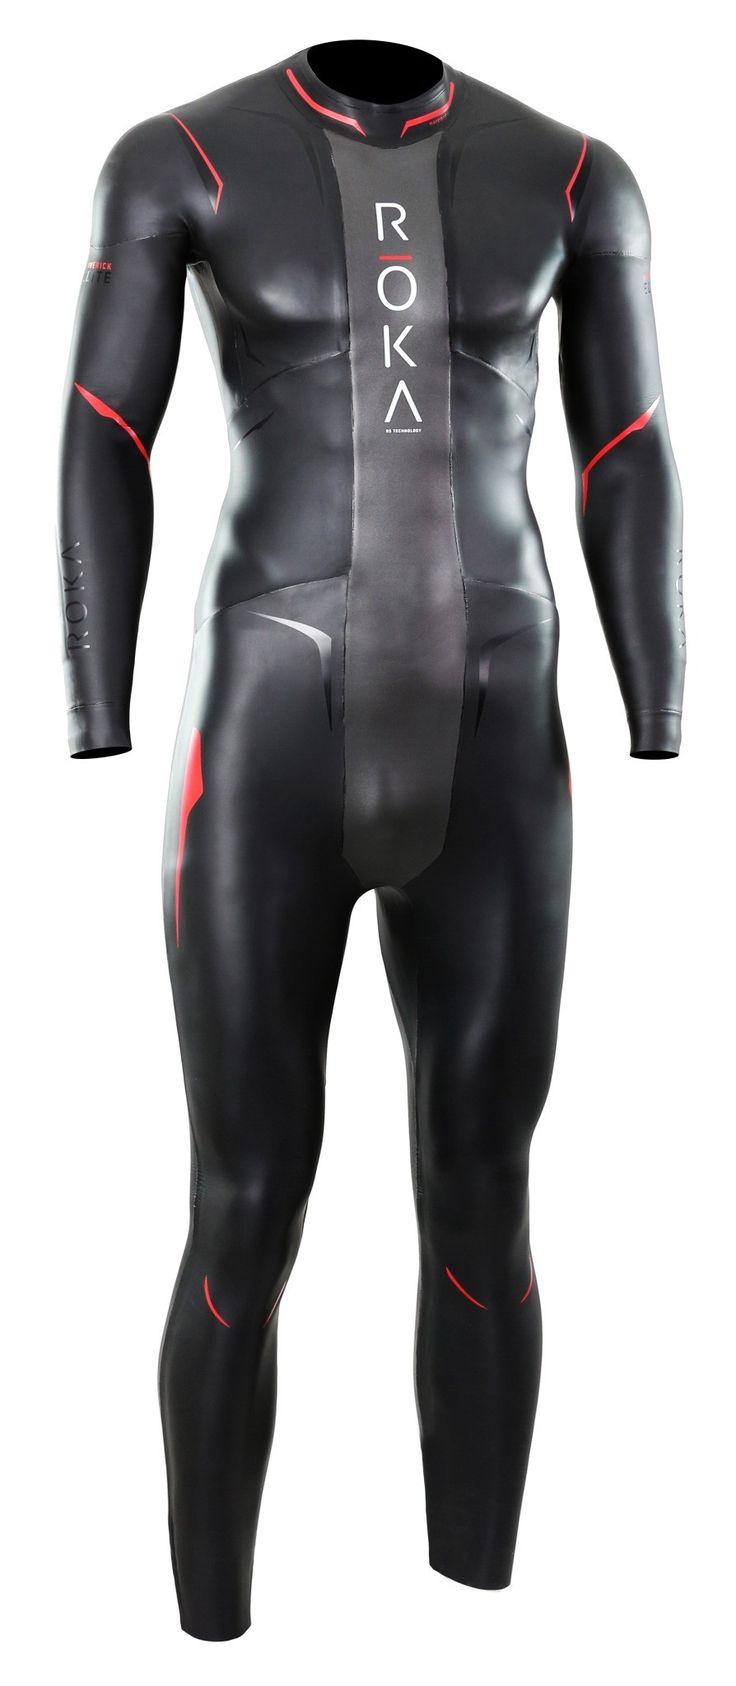 IRONMAN Store | Triathlon Gear and Triathlon Clothing IRONMAN ROKA Maverick Elite Full Wetsuit - Men's